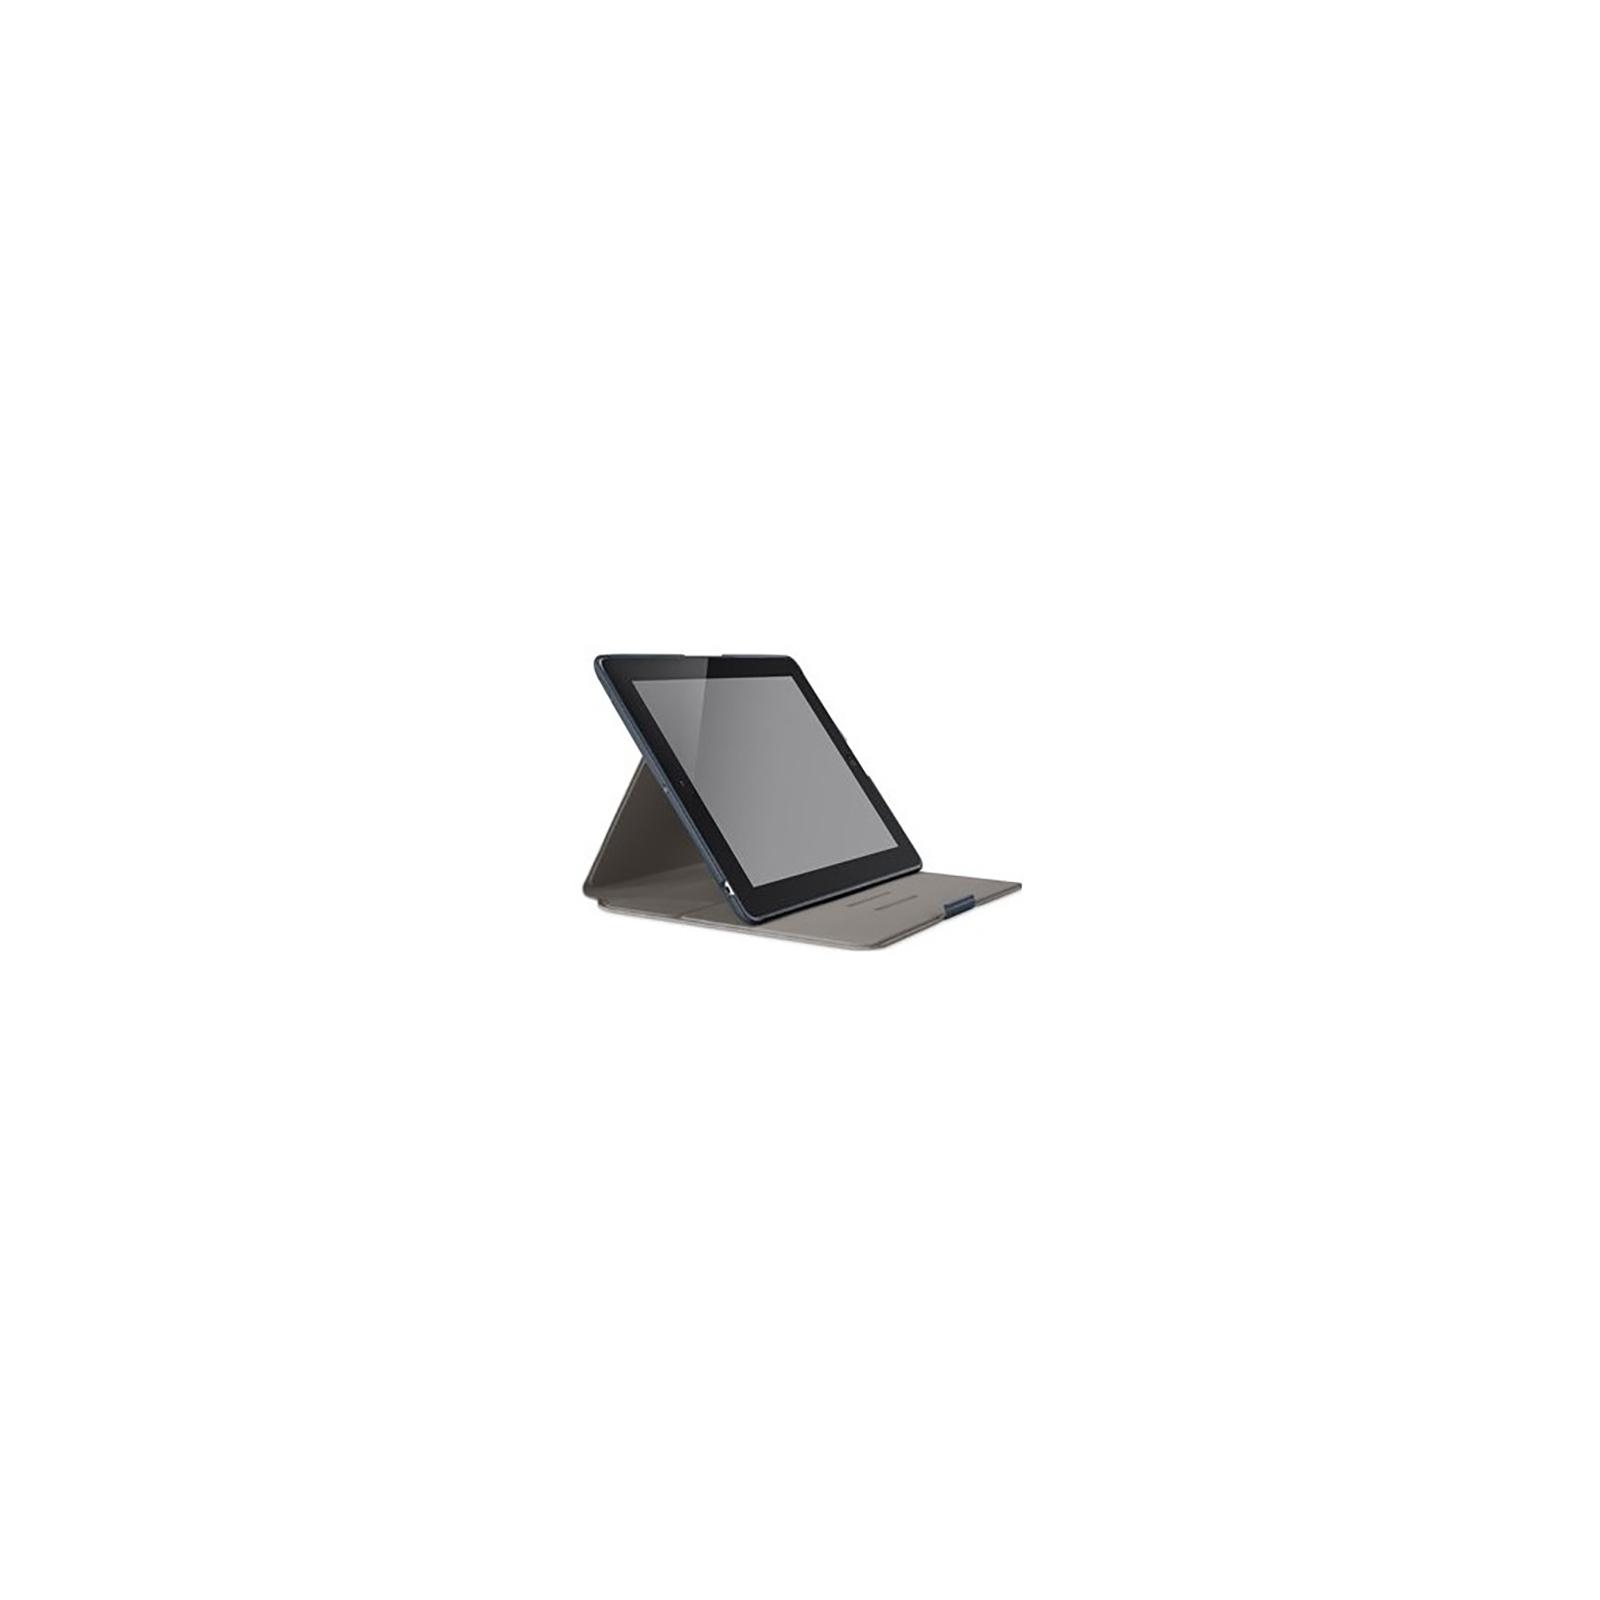 Чехол для планшета Belkin iPad Air FormFit Cover /Black (F7N063B2C00) изображение 3